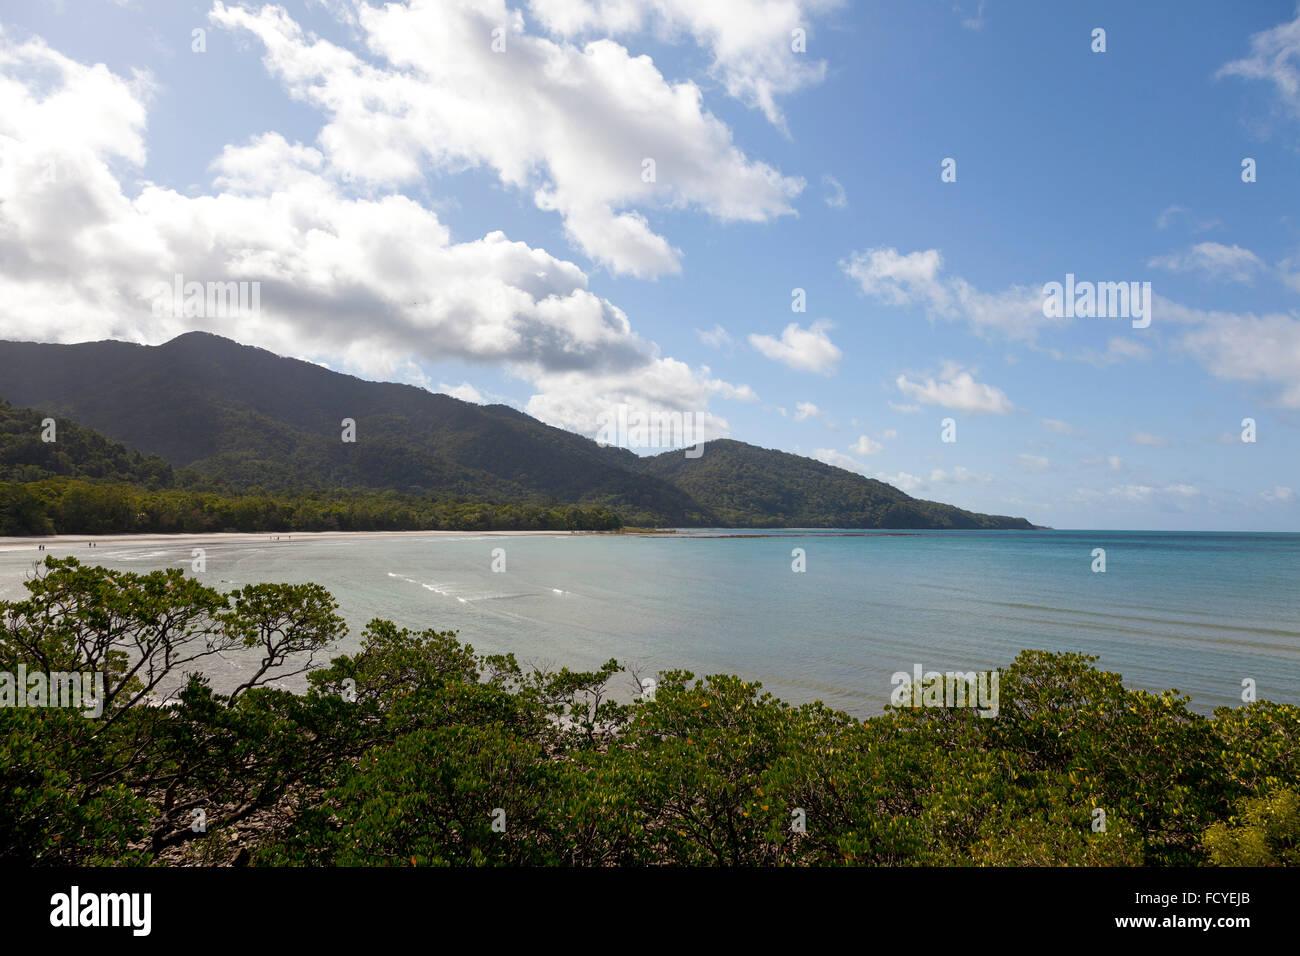 Kulki lookout in Cape Tribulation, Queensland,Australia - Stock Image